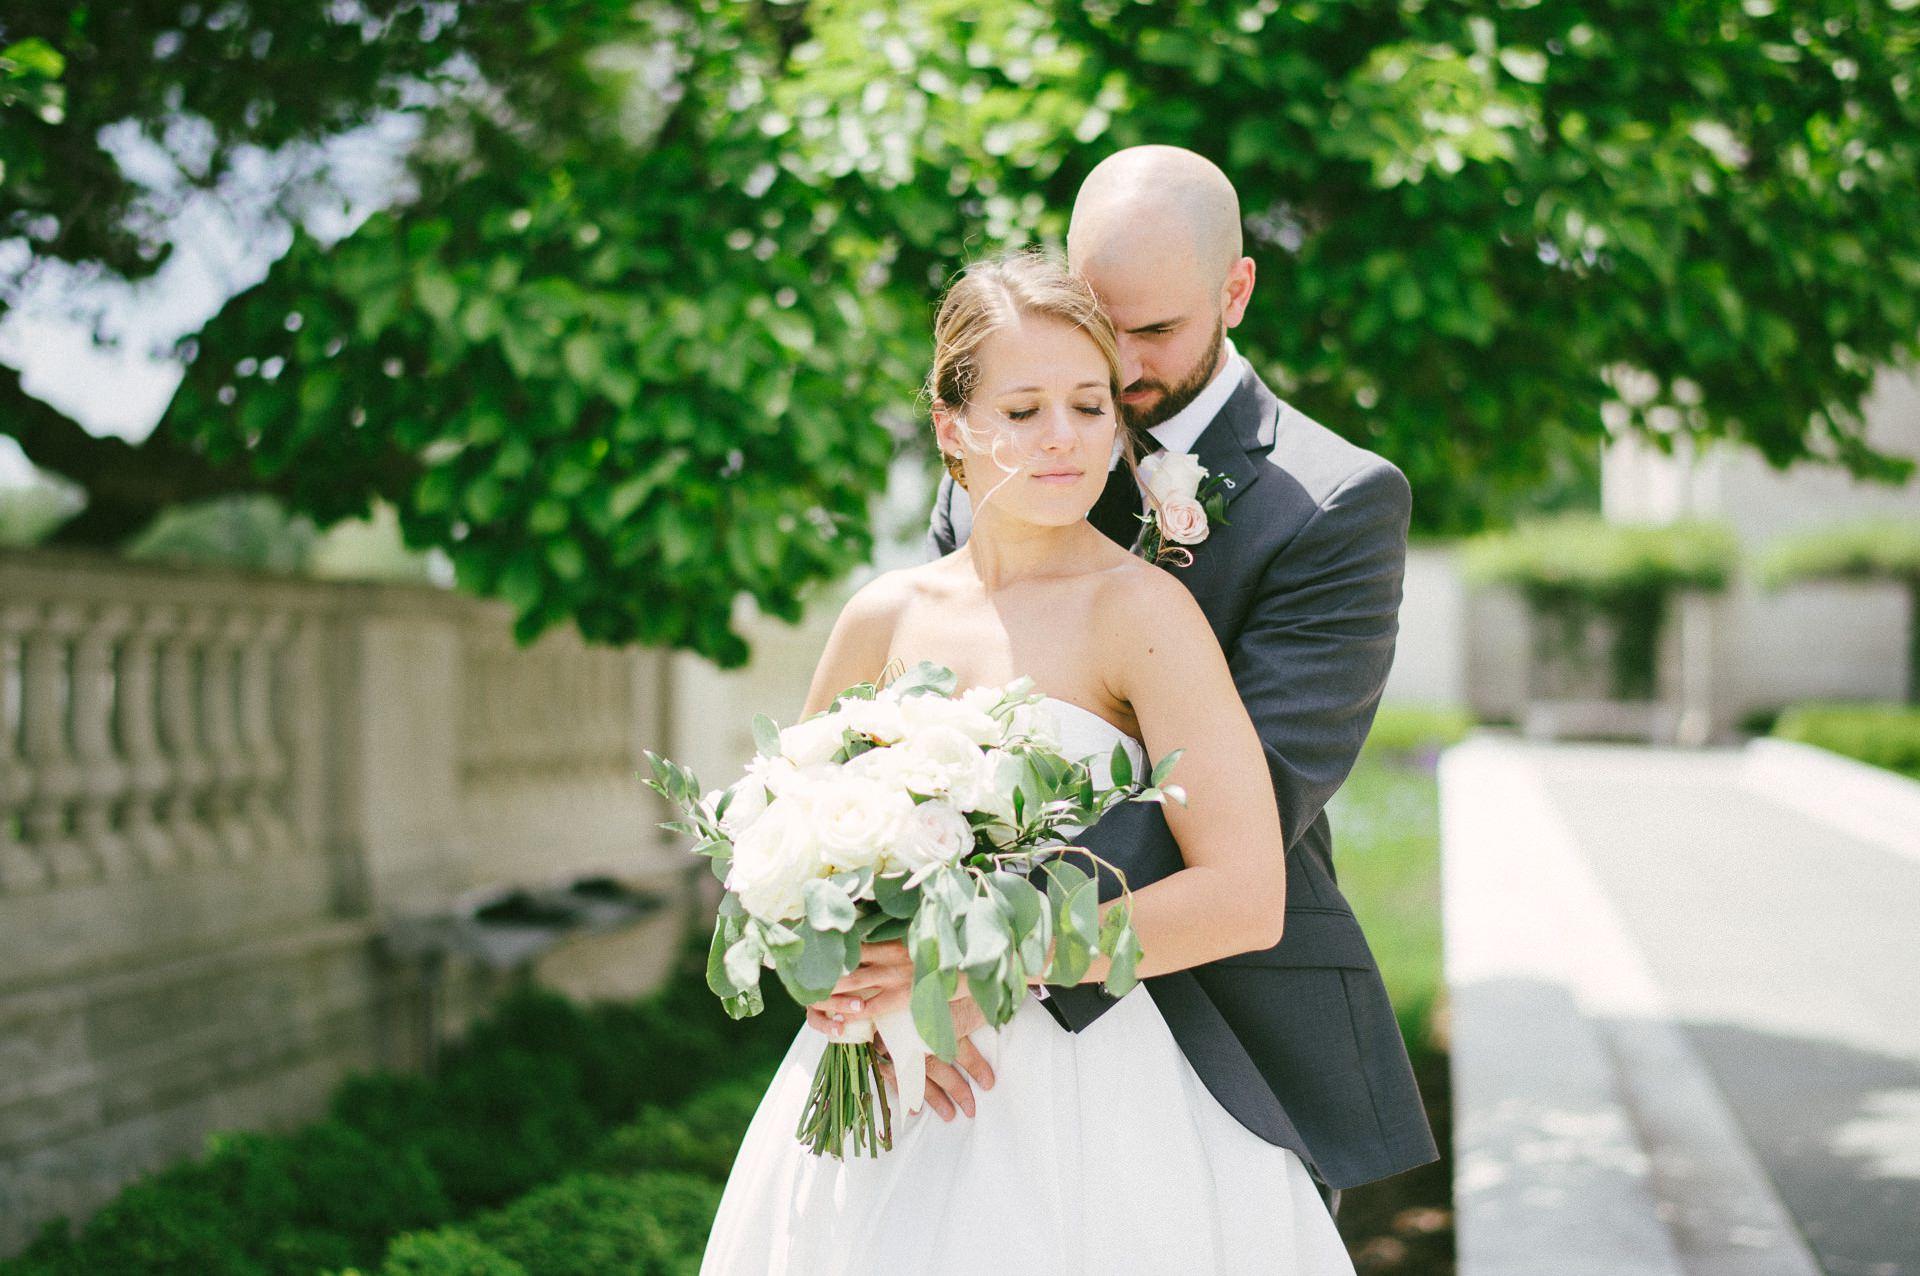 Dowtown Hilton Cleveland Wedding Photographer 1 42.jpg